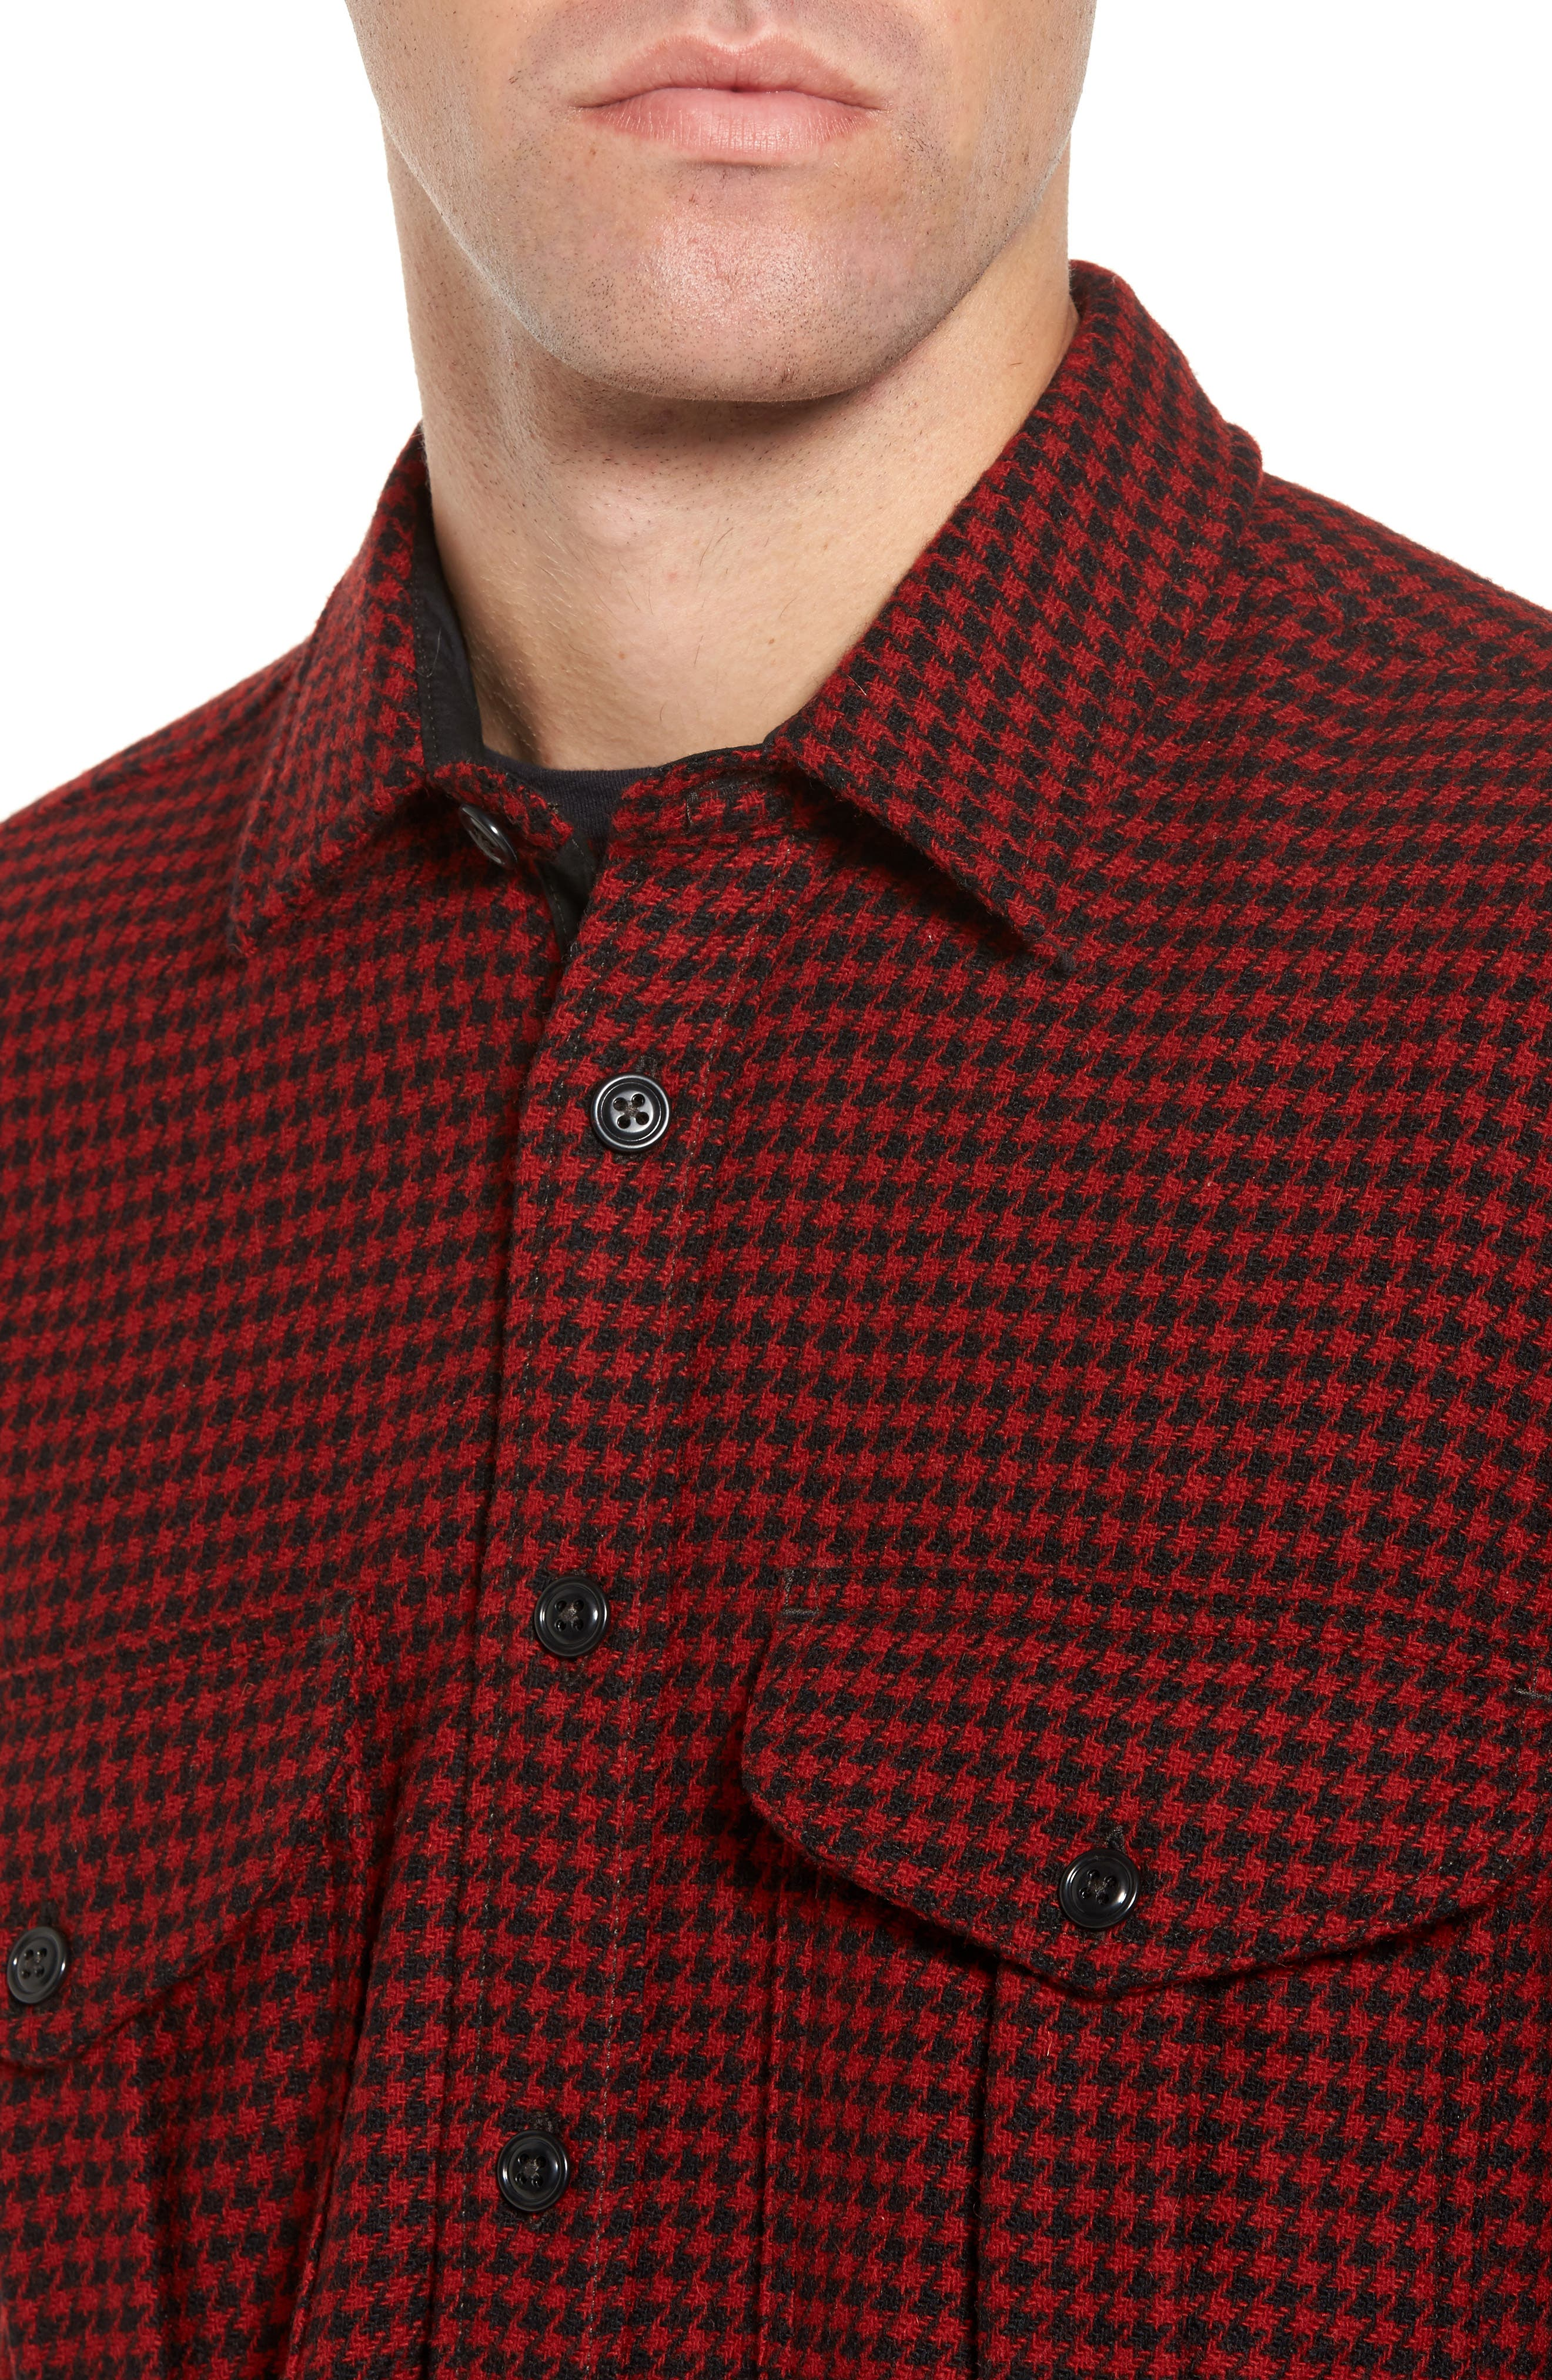 Northwest Houndstooth Shirt Jacket,                             Alternate thumbnail 4, color,                             645